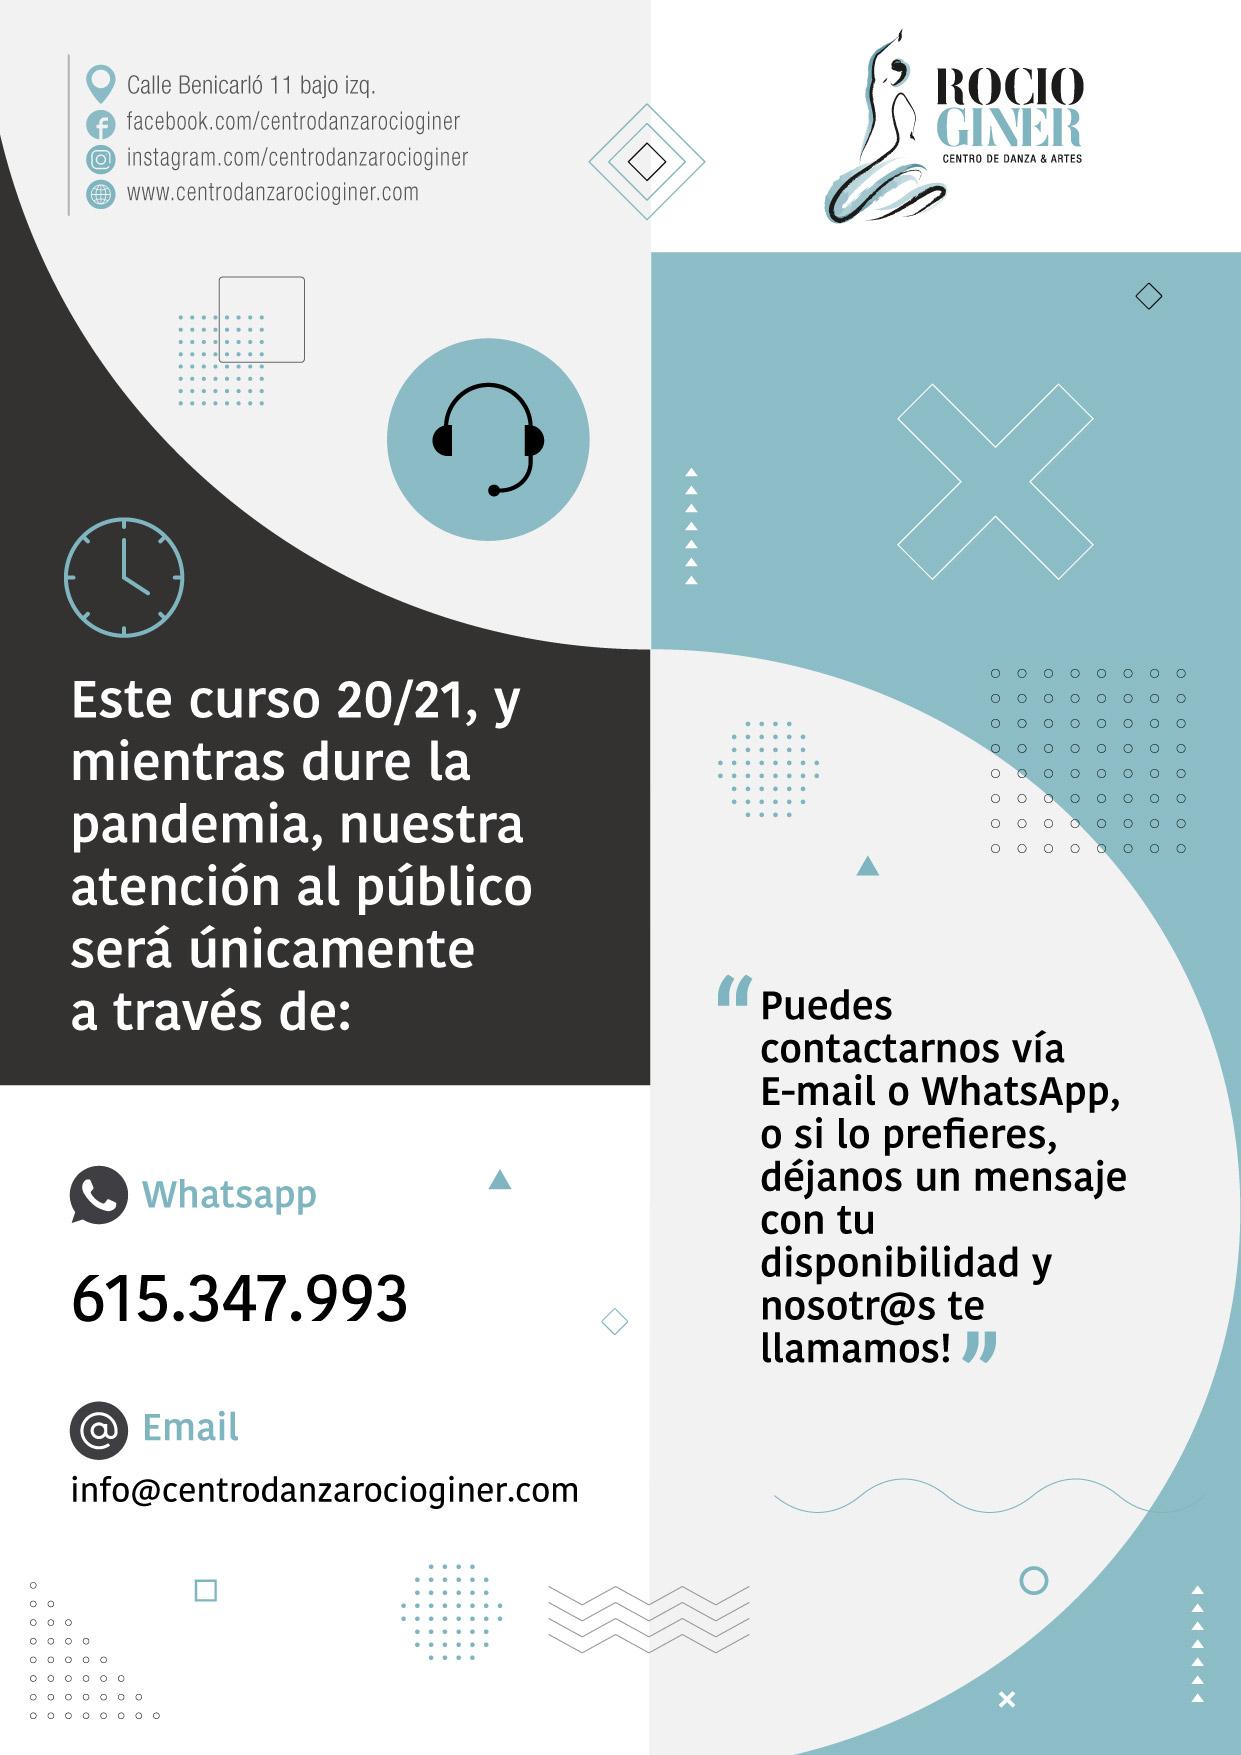 Horario atencion 2020-21 Pandemia2_design FRONT copia